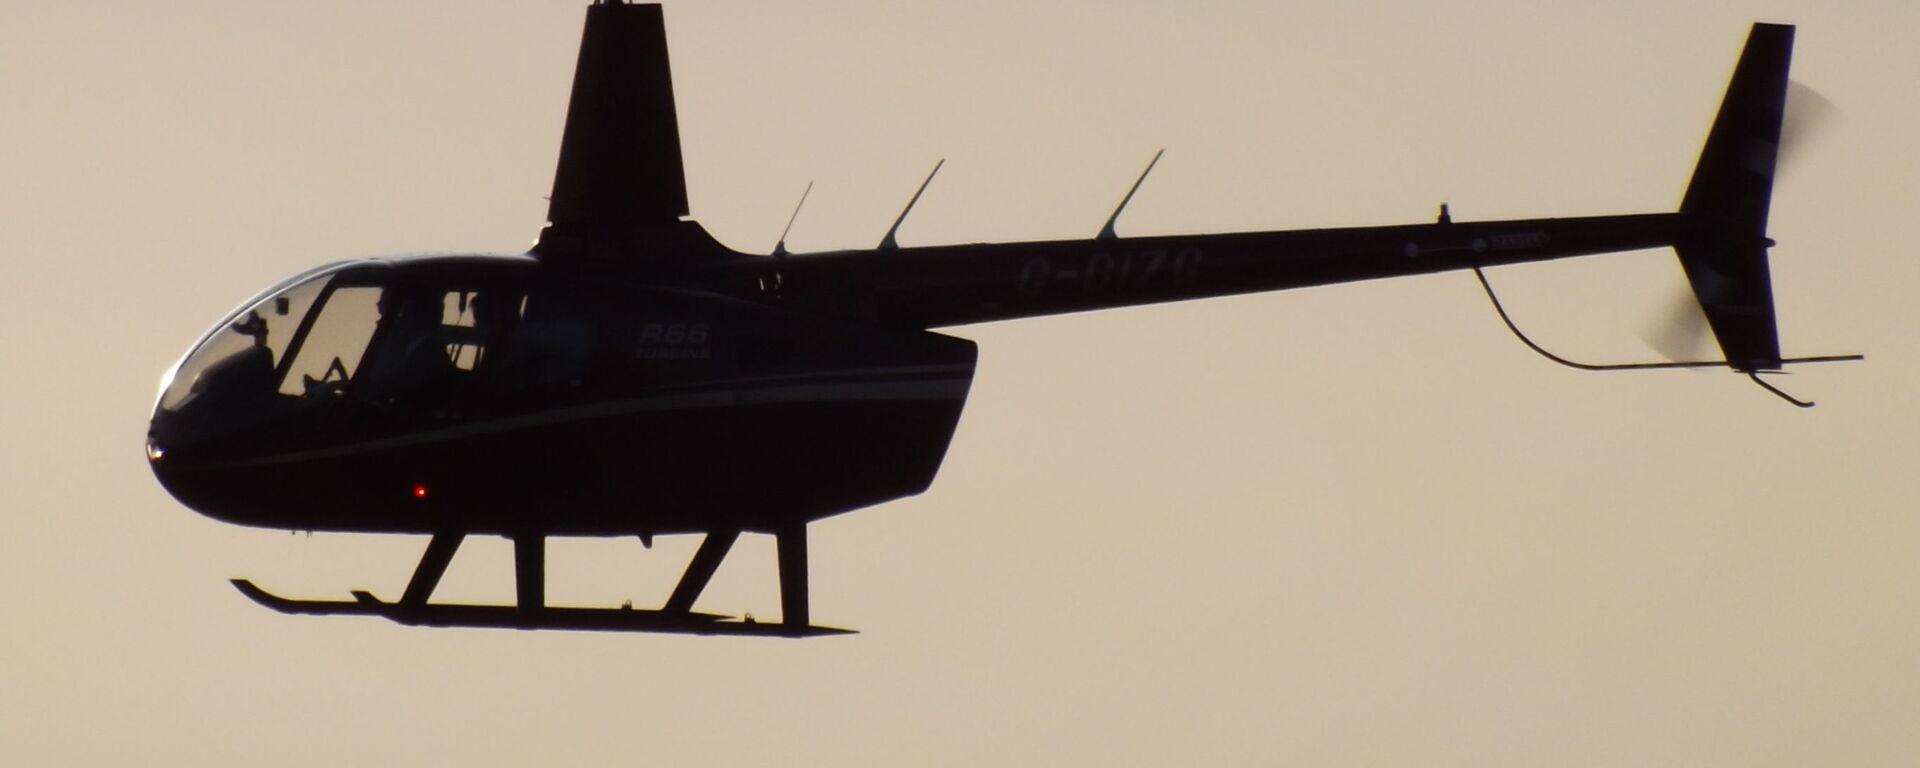 Helikopter model Robinson R66. - Sputnik Polska, 1920, 02.08.2021